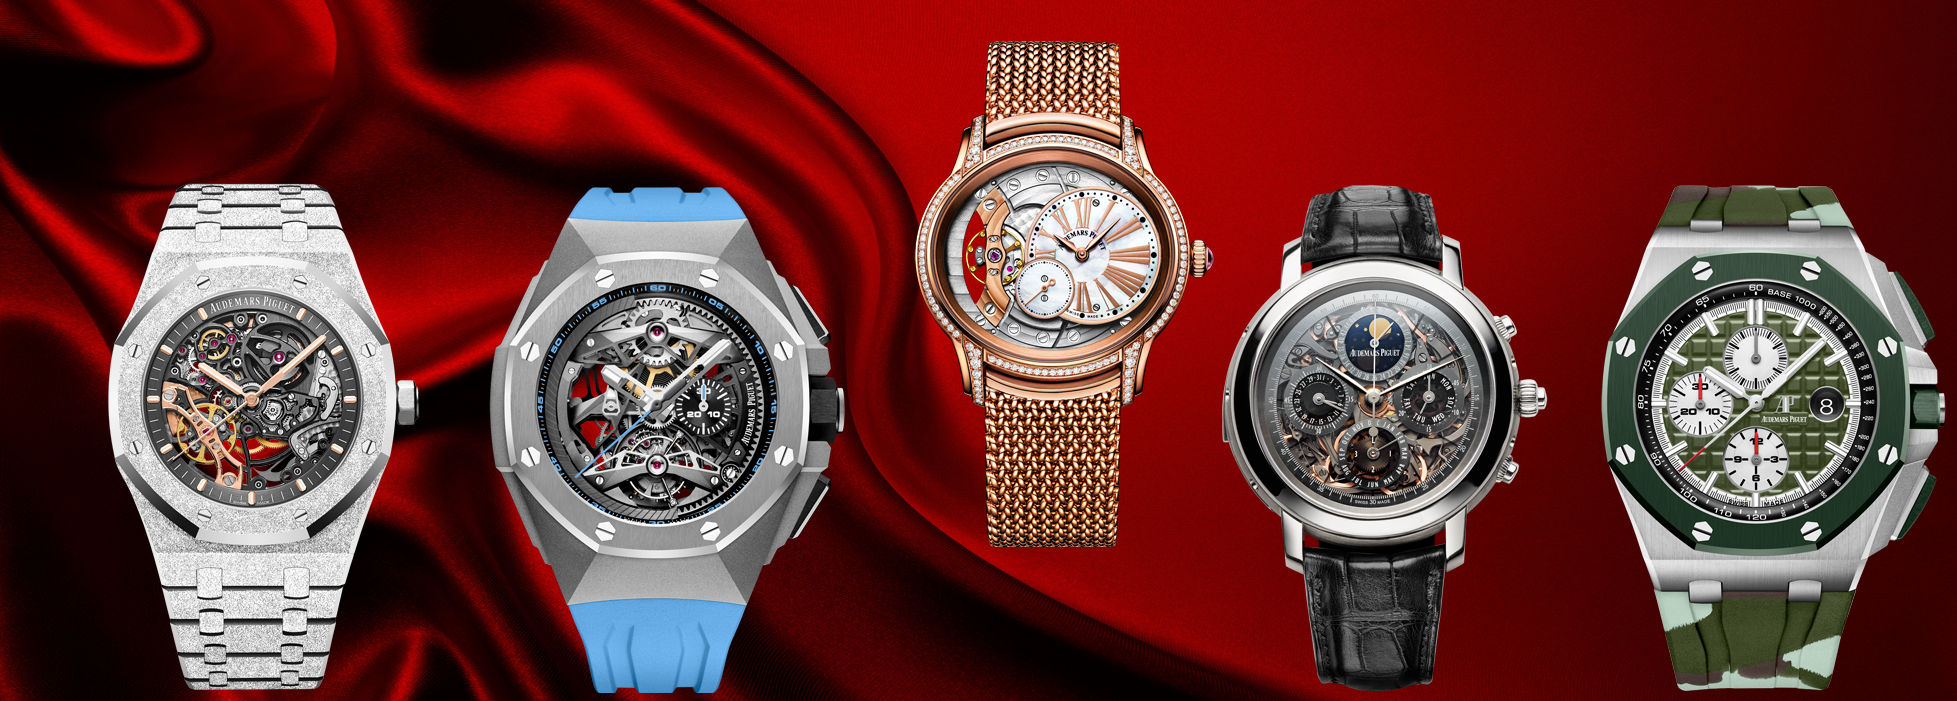 Audermars Piguet Watches